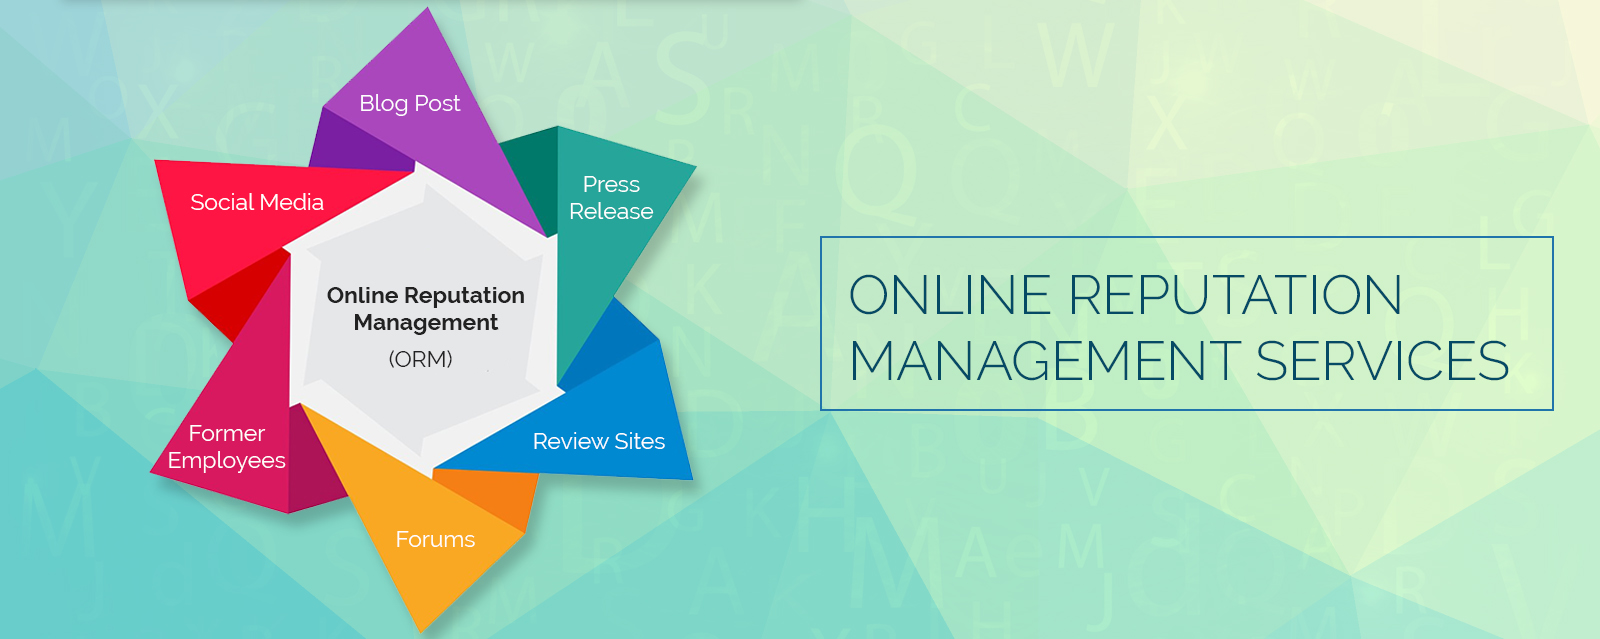 Online Reputation Services